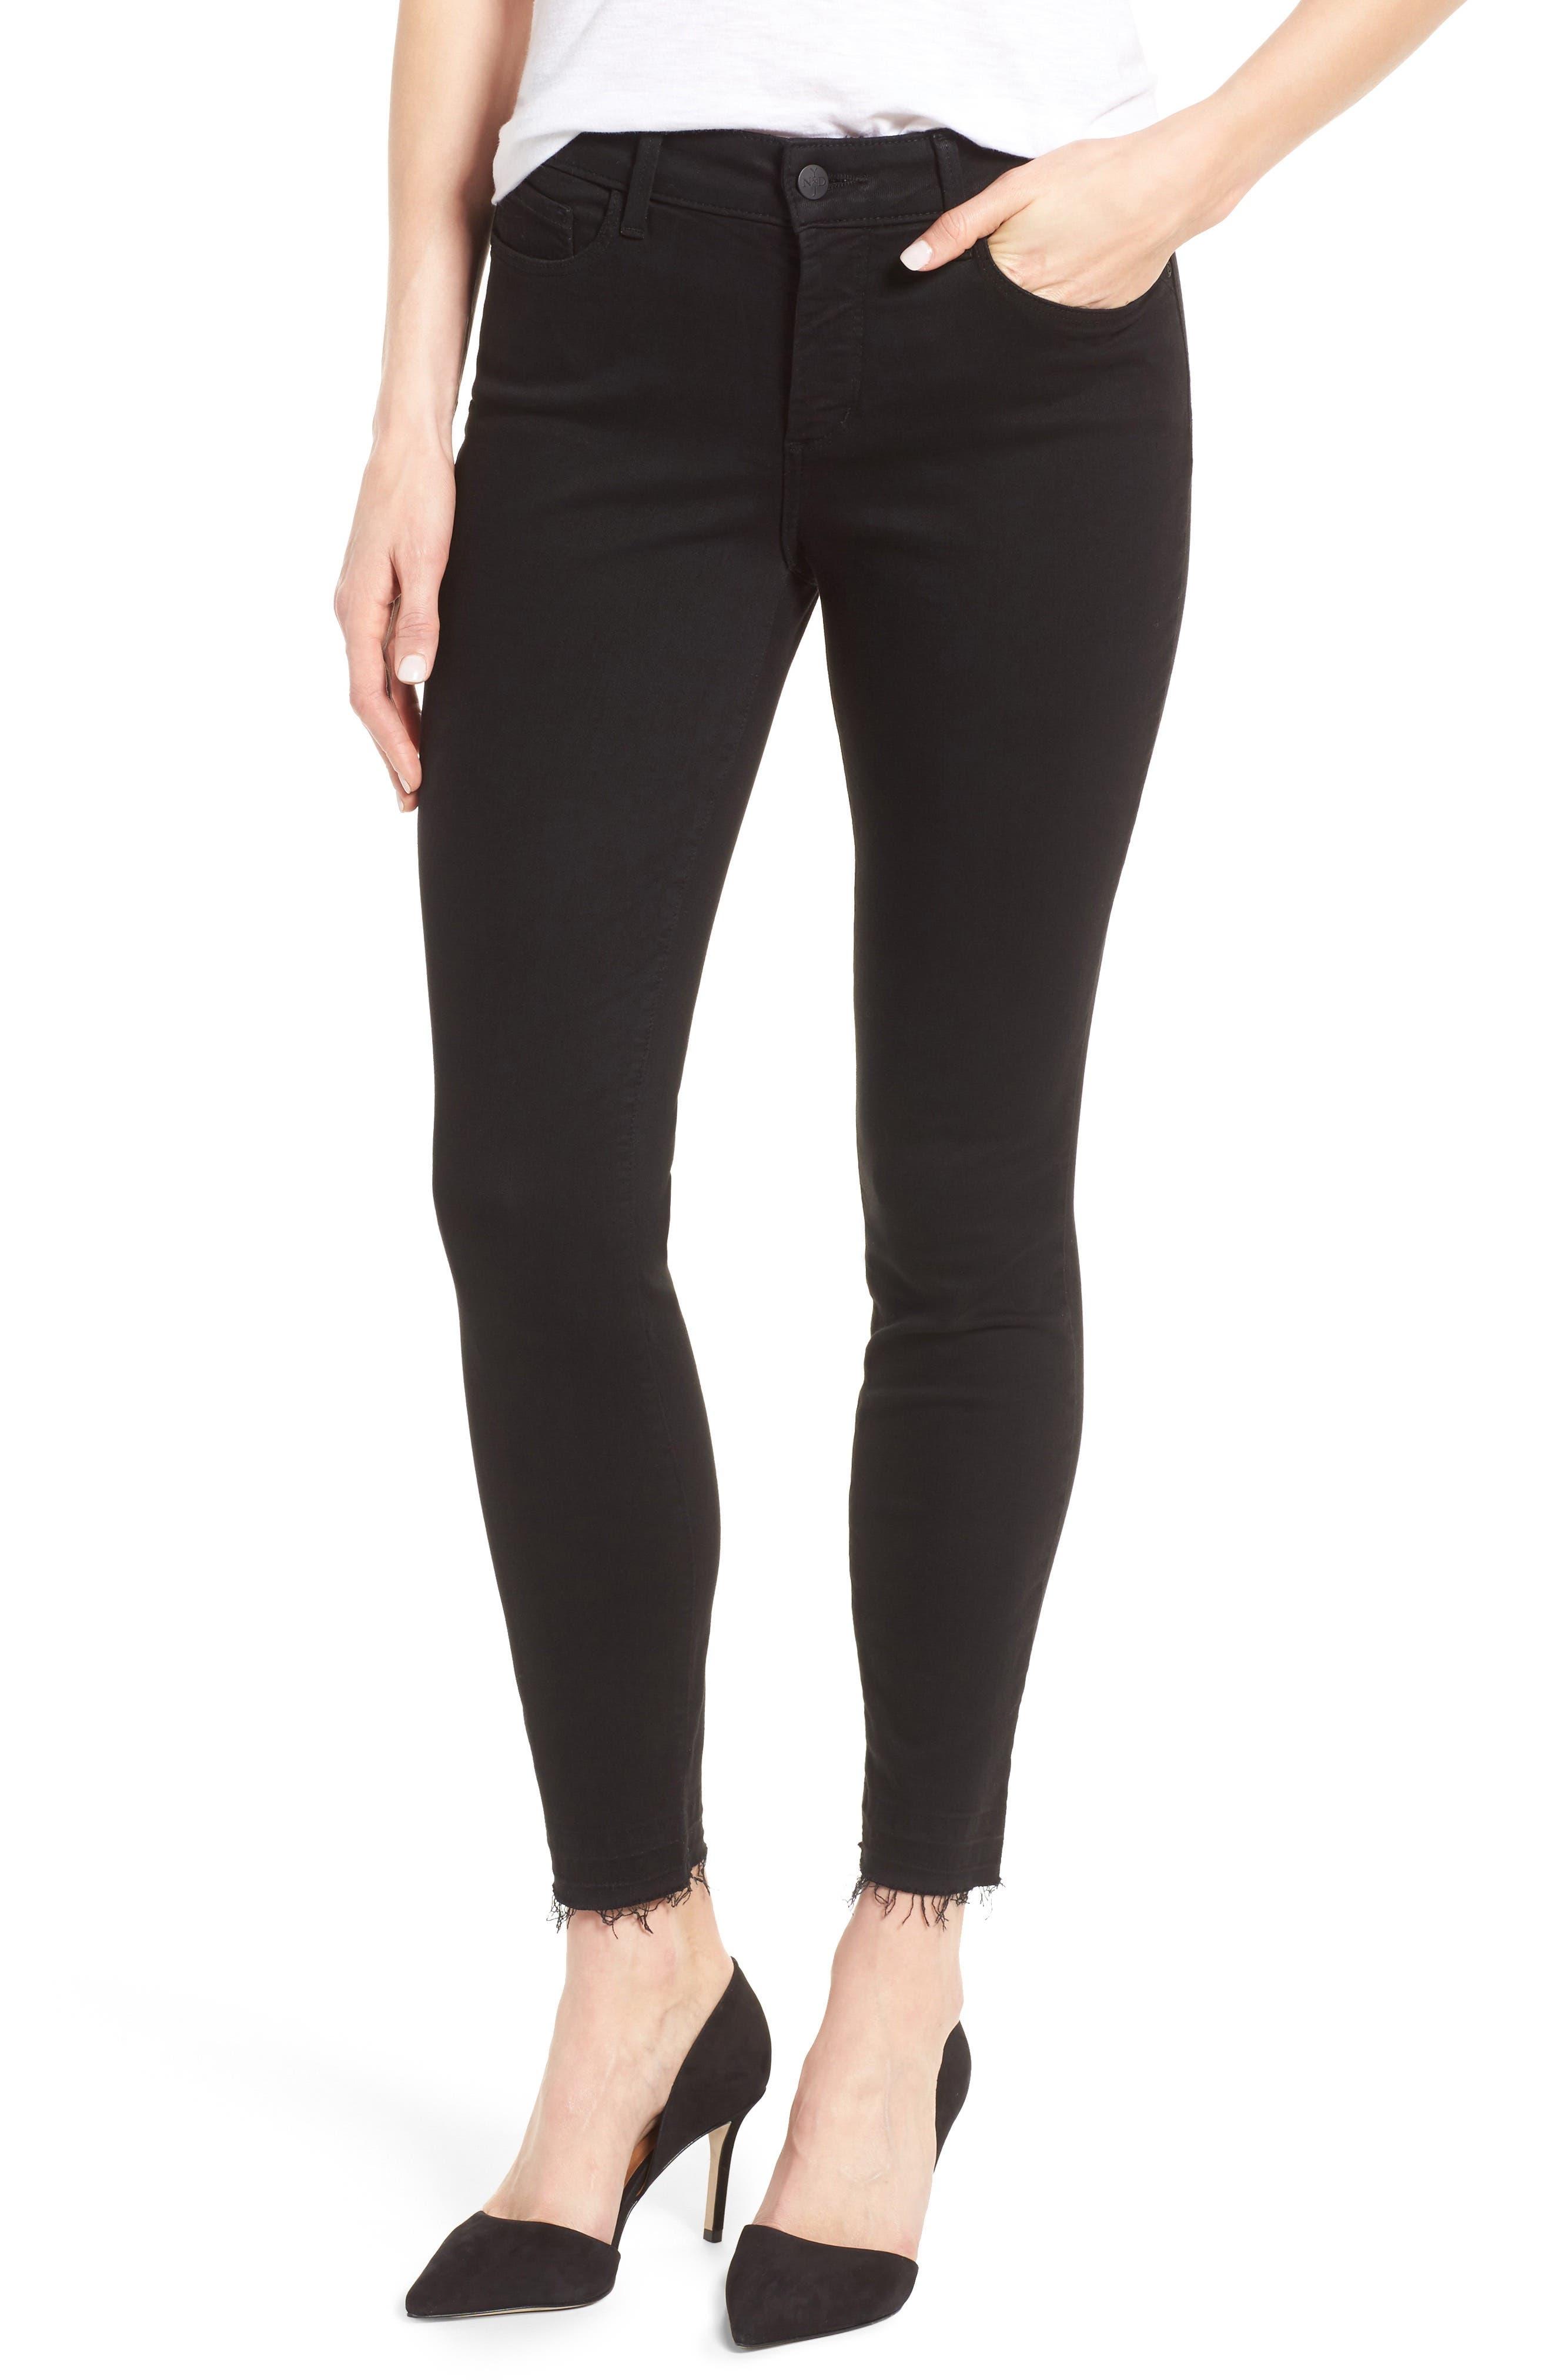 Main Image - NYDJ Ami Release Hem Stretch Skinny Jeans (Regular & Petite)